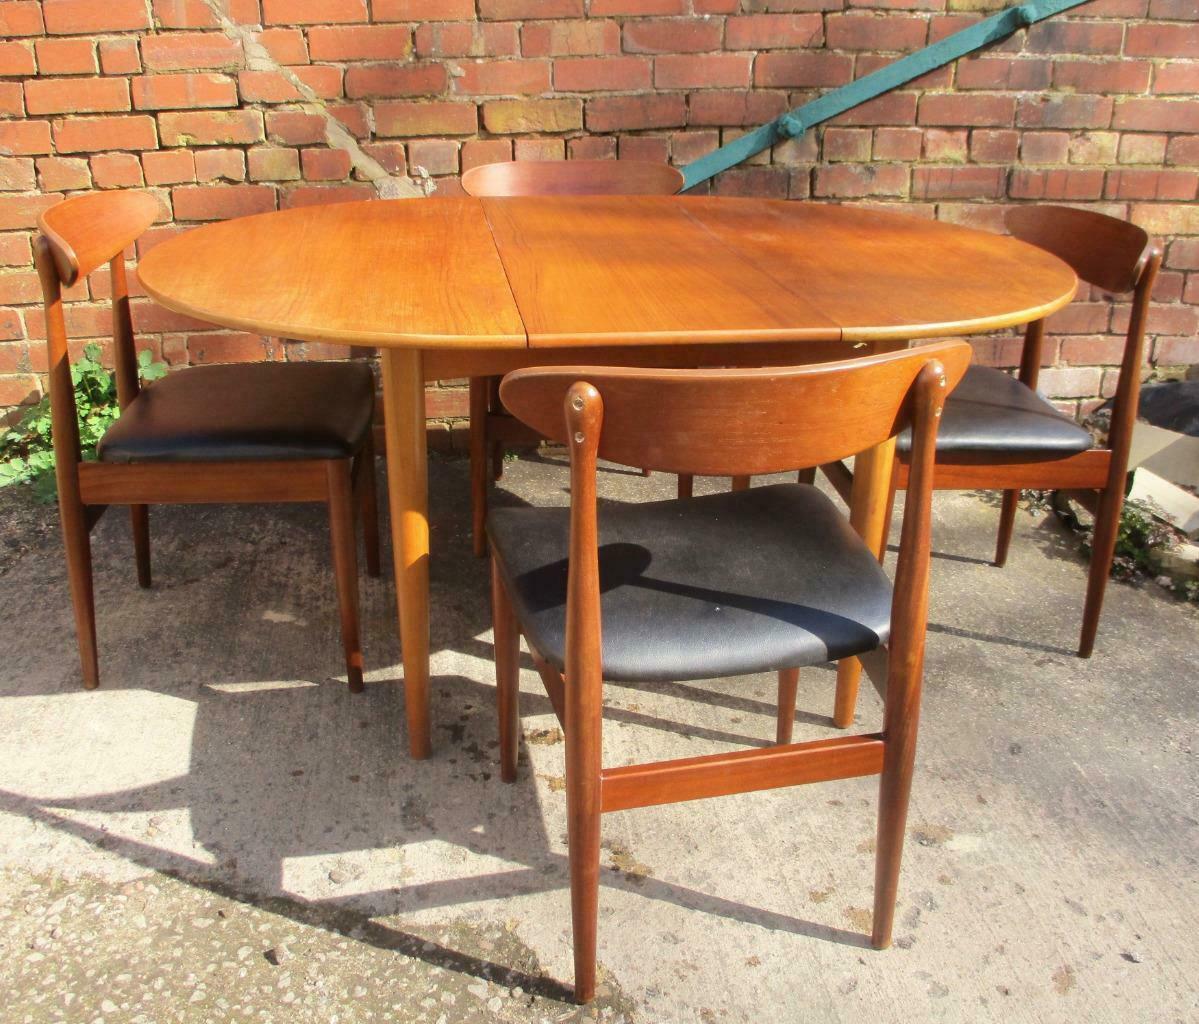 Vintage 1960 S Extending Teak Round Dining Table 4 Chairs Mid Century Retro G Plan Vinterior